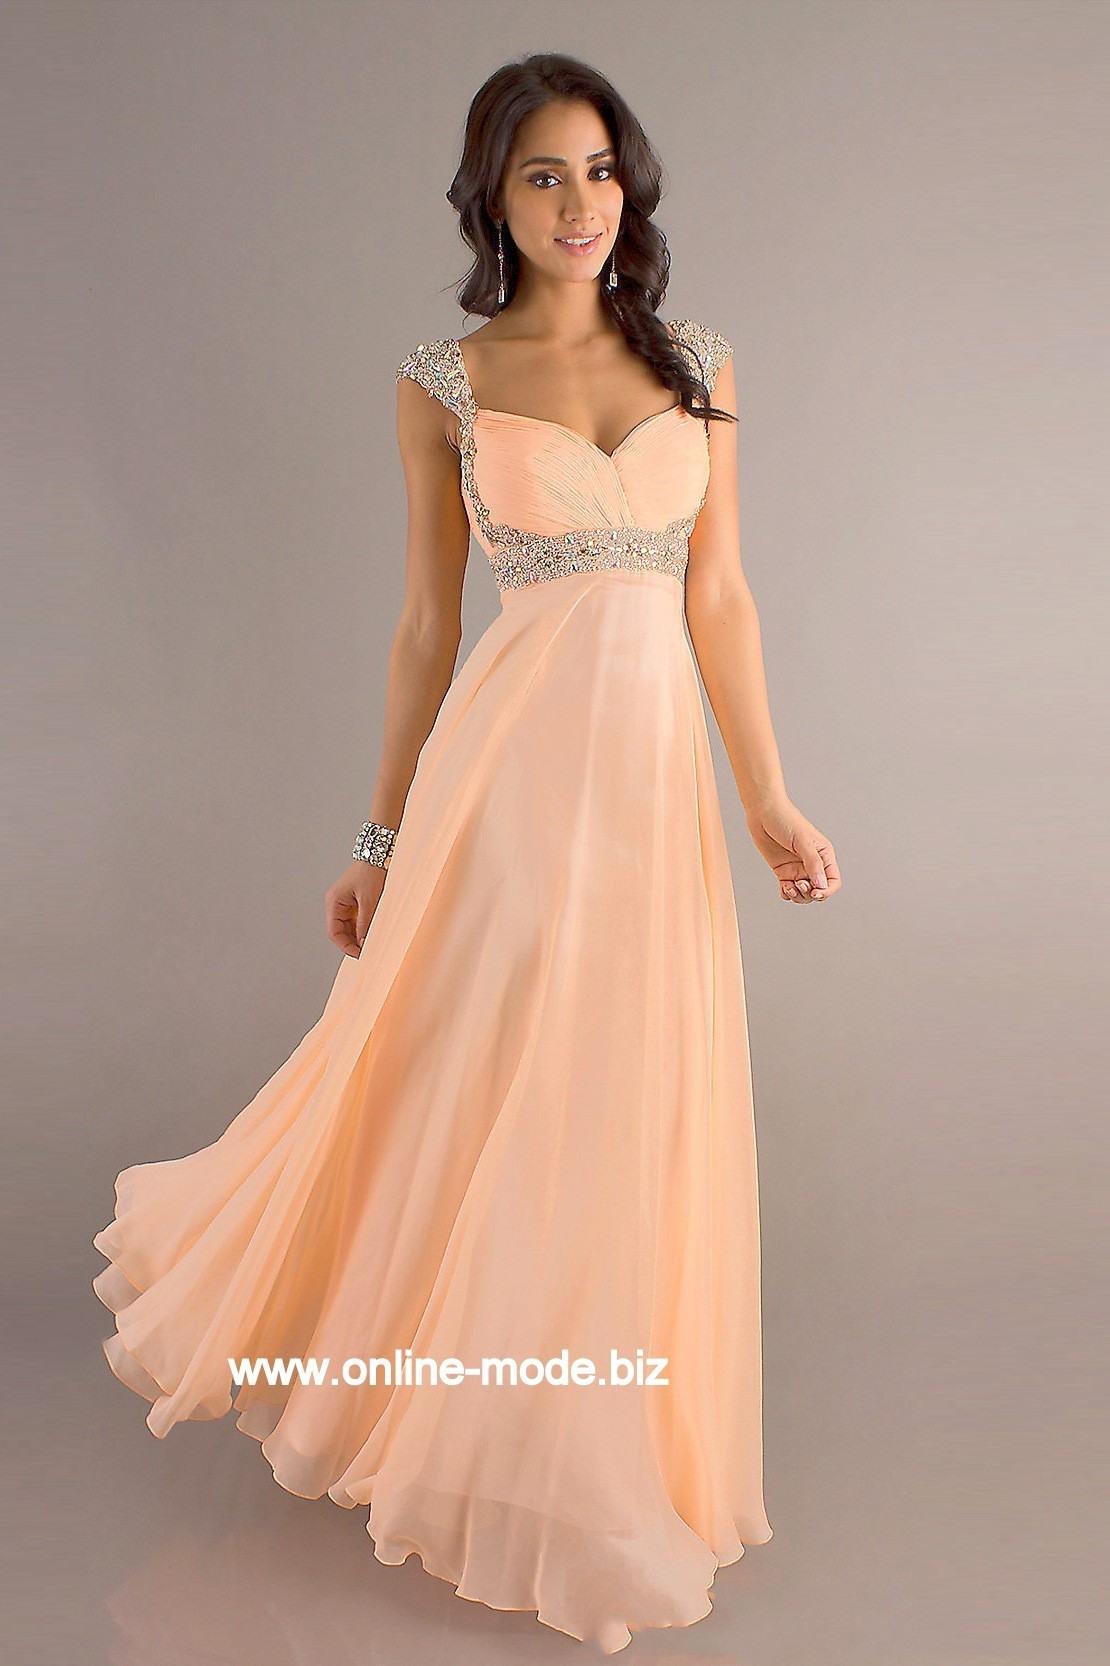 17 Wunderbar Abendkleid C&A VertriebDesigner Coolste Abendkleid C&A Design